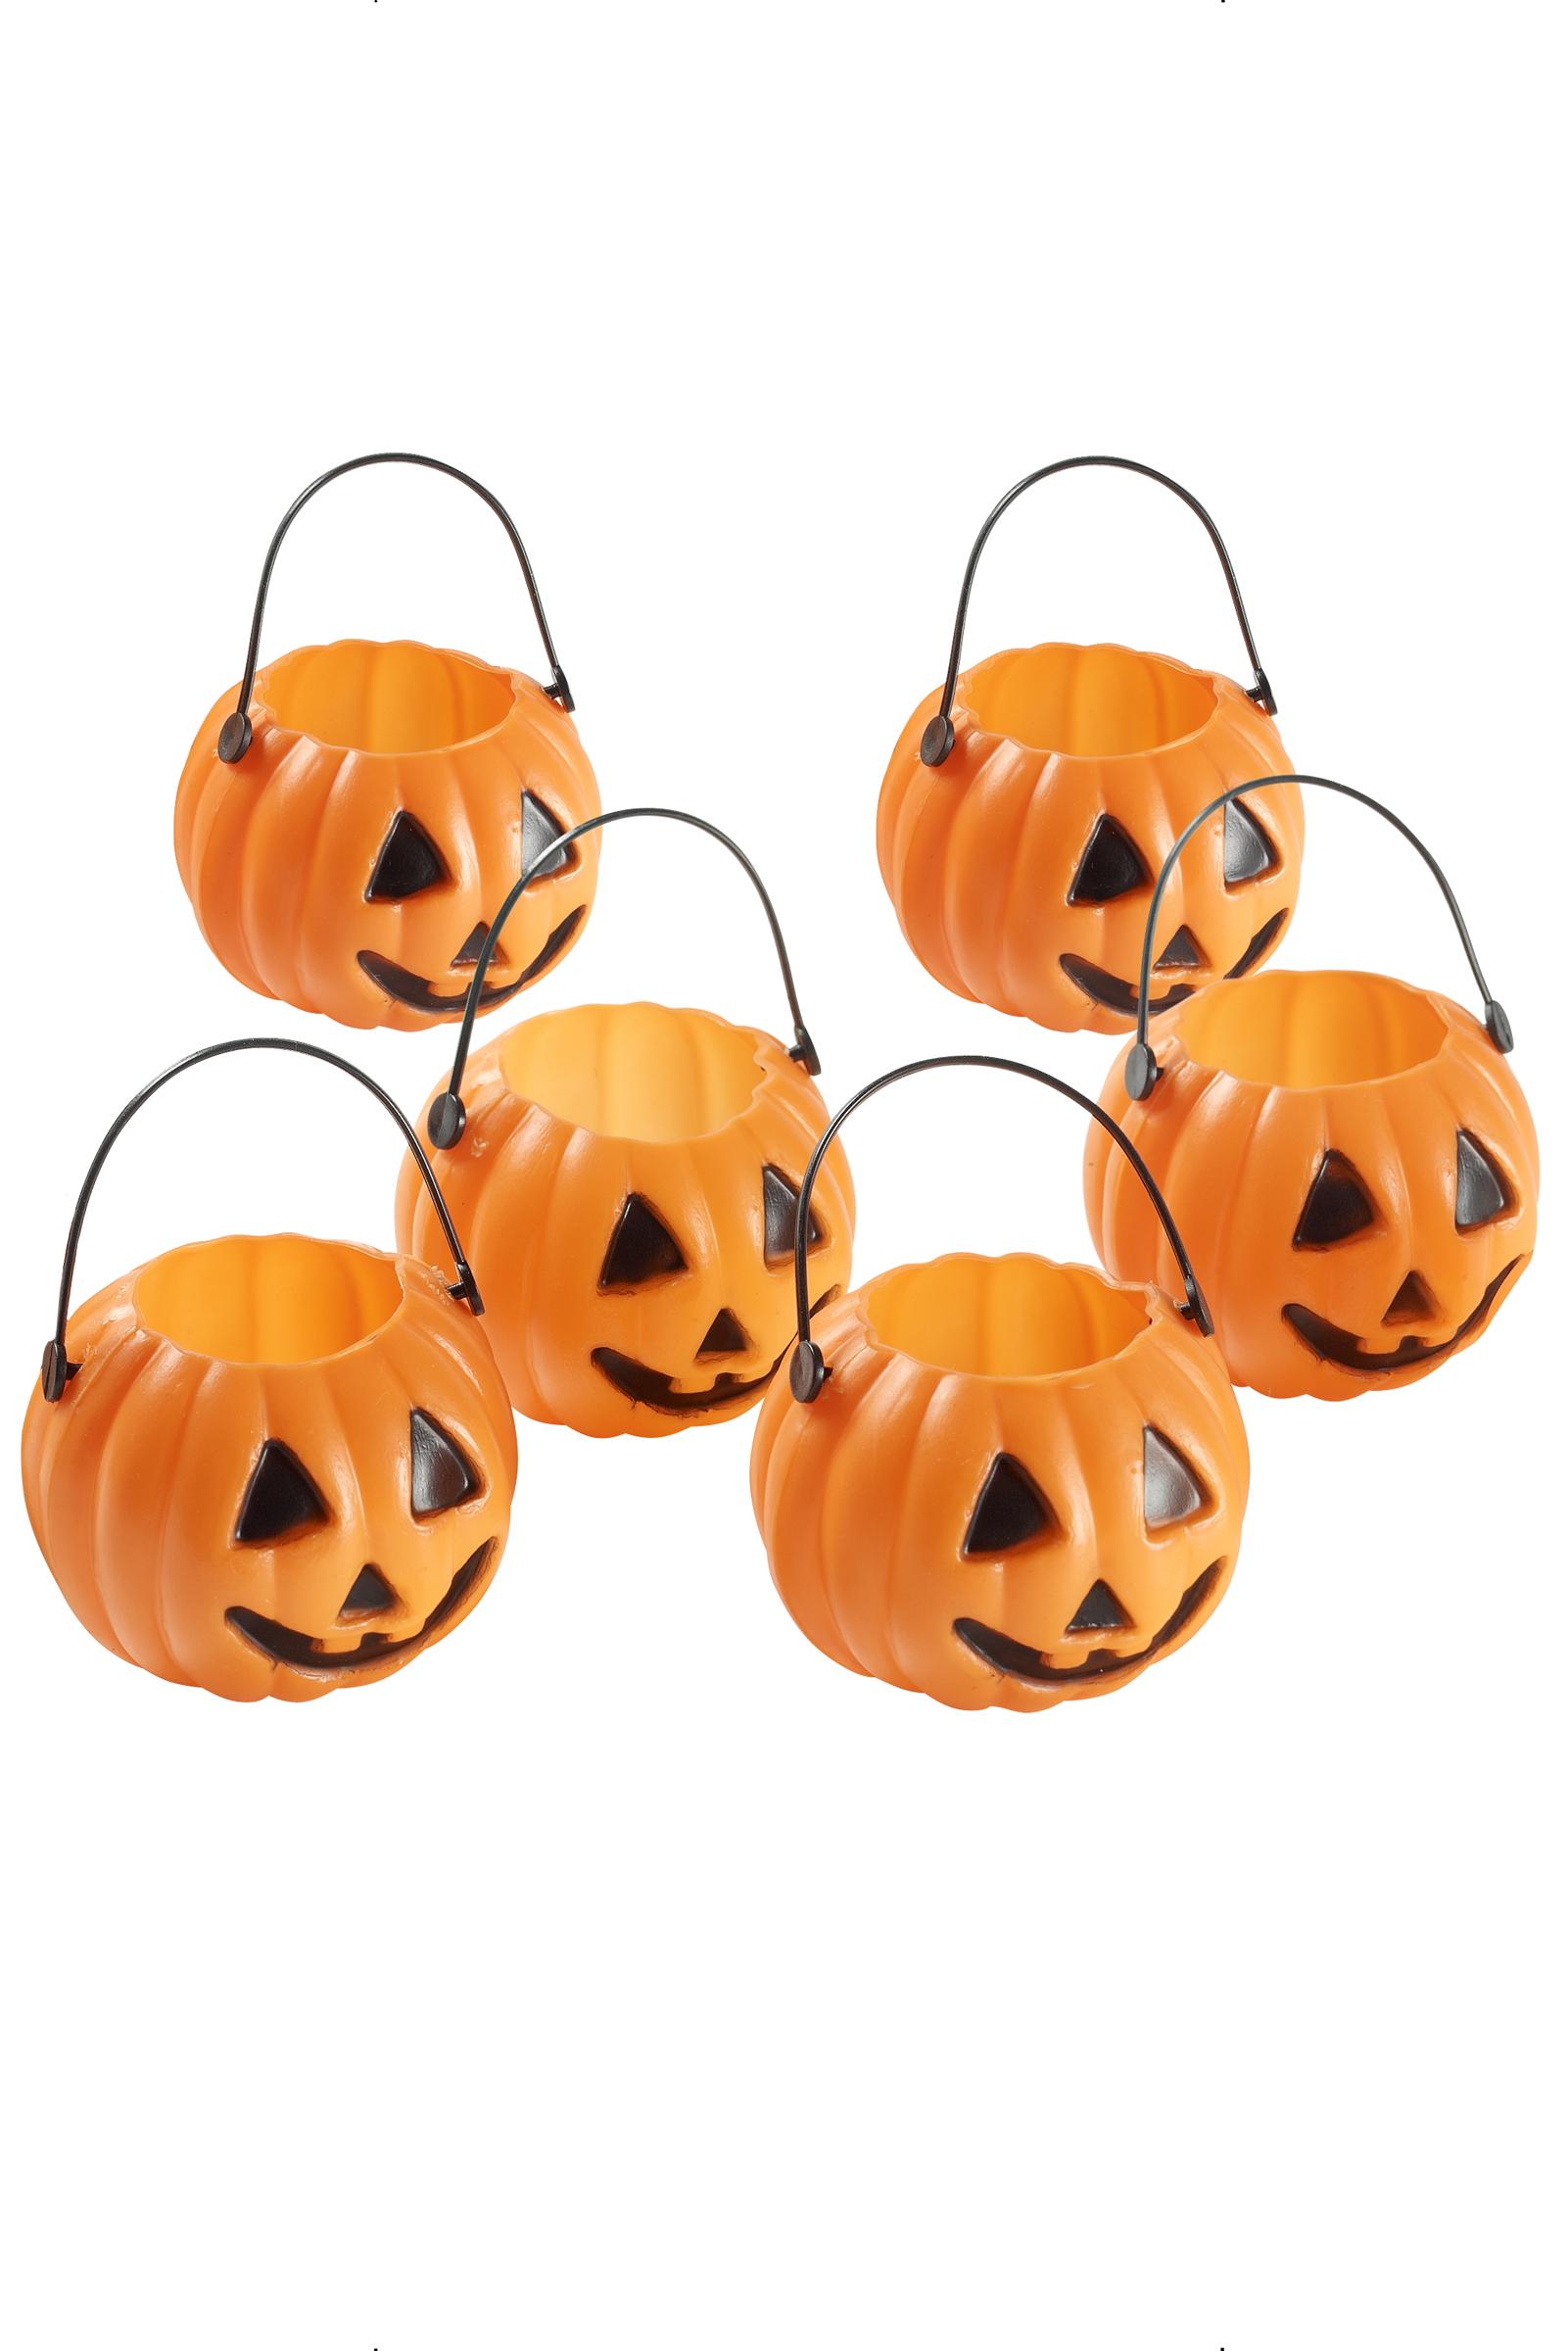 Mini citrouilles bonbonni res halloween deguise toi achat de accessoires - Deguisetoi fr halloween ...